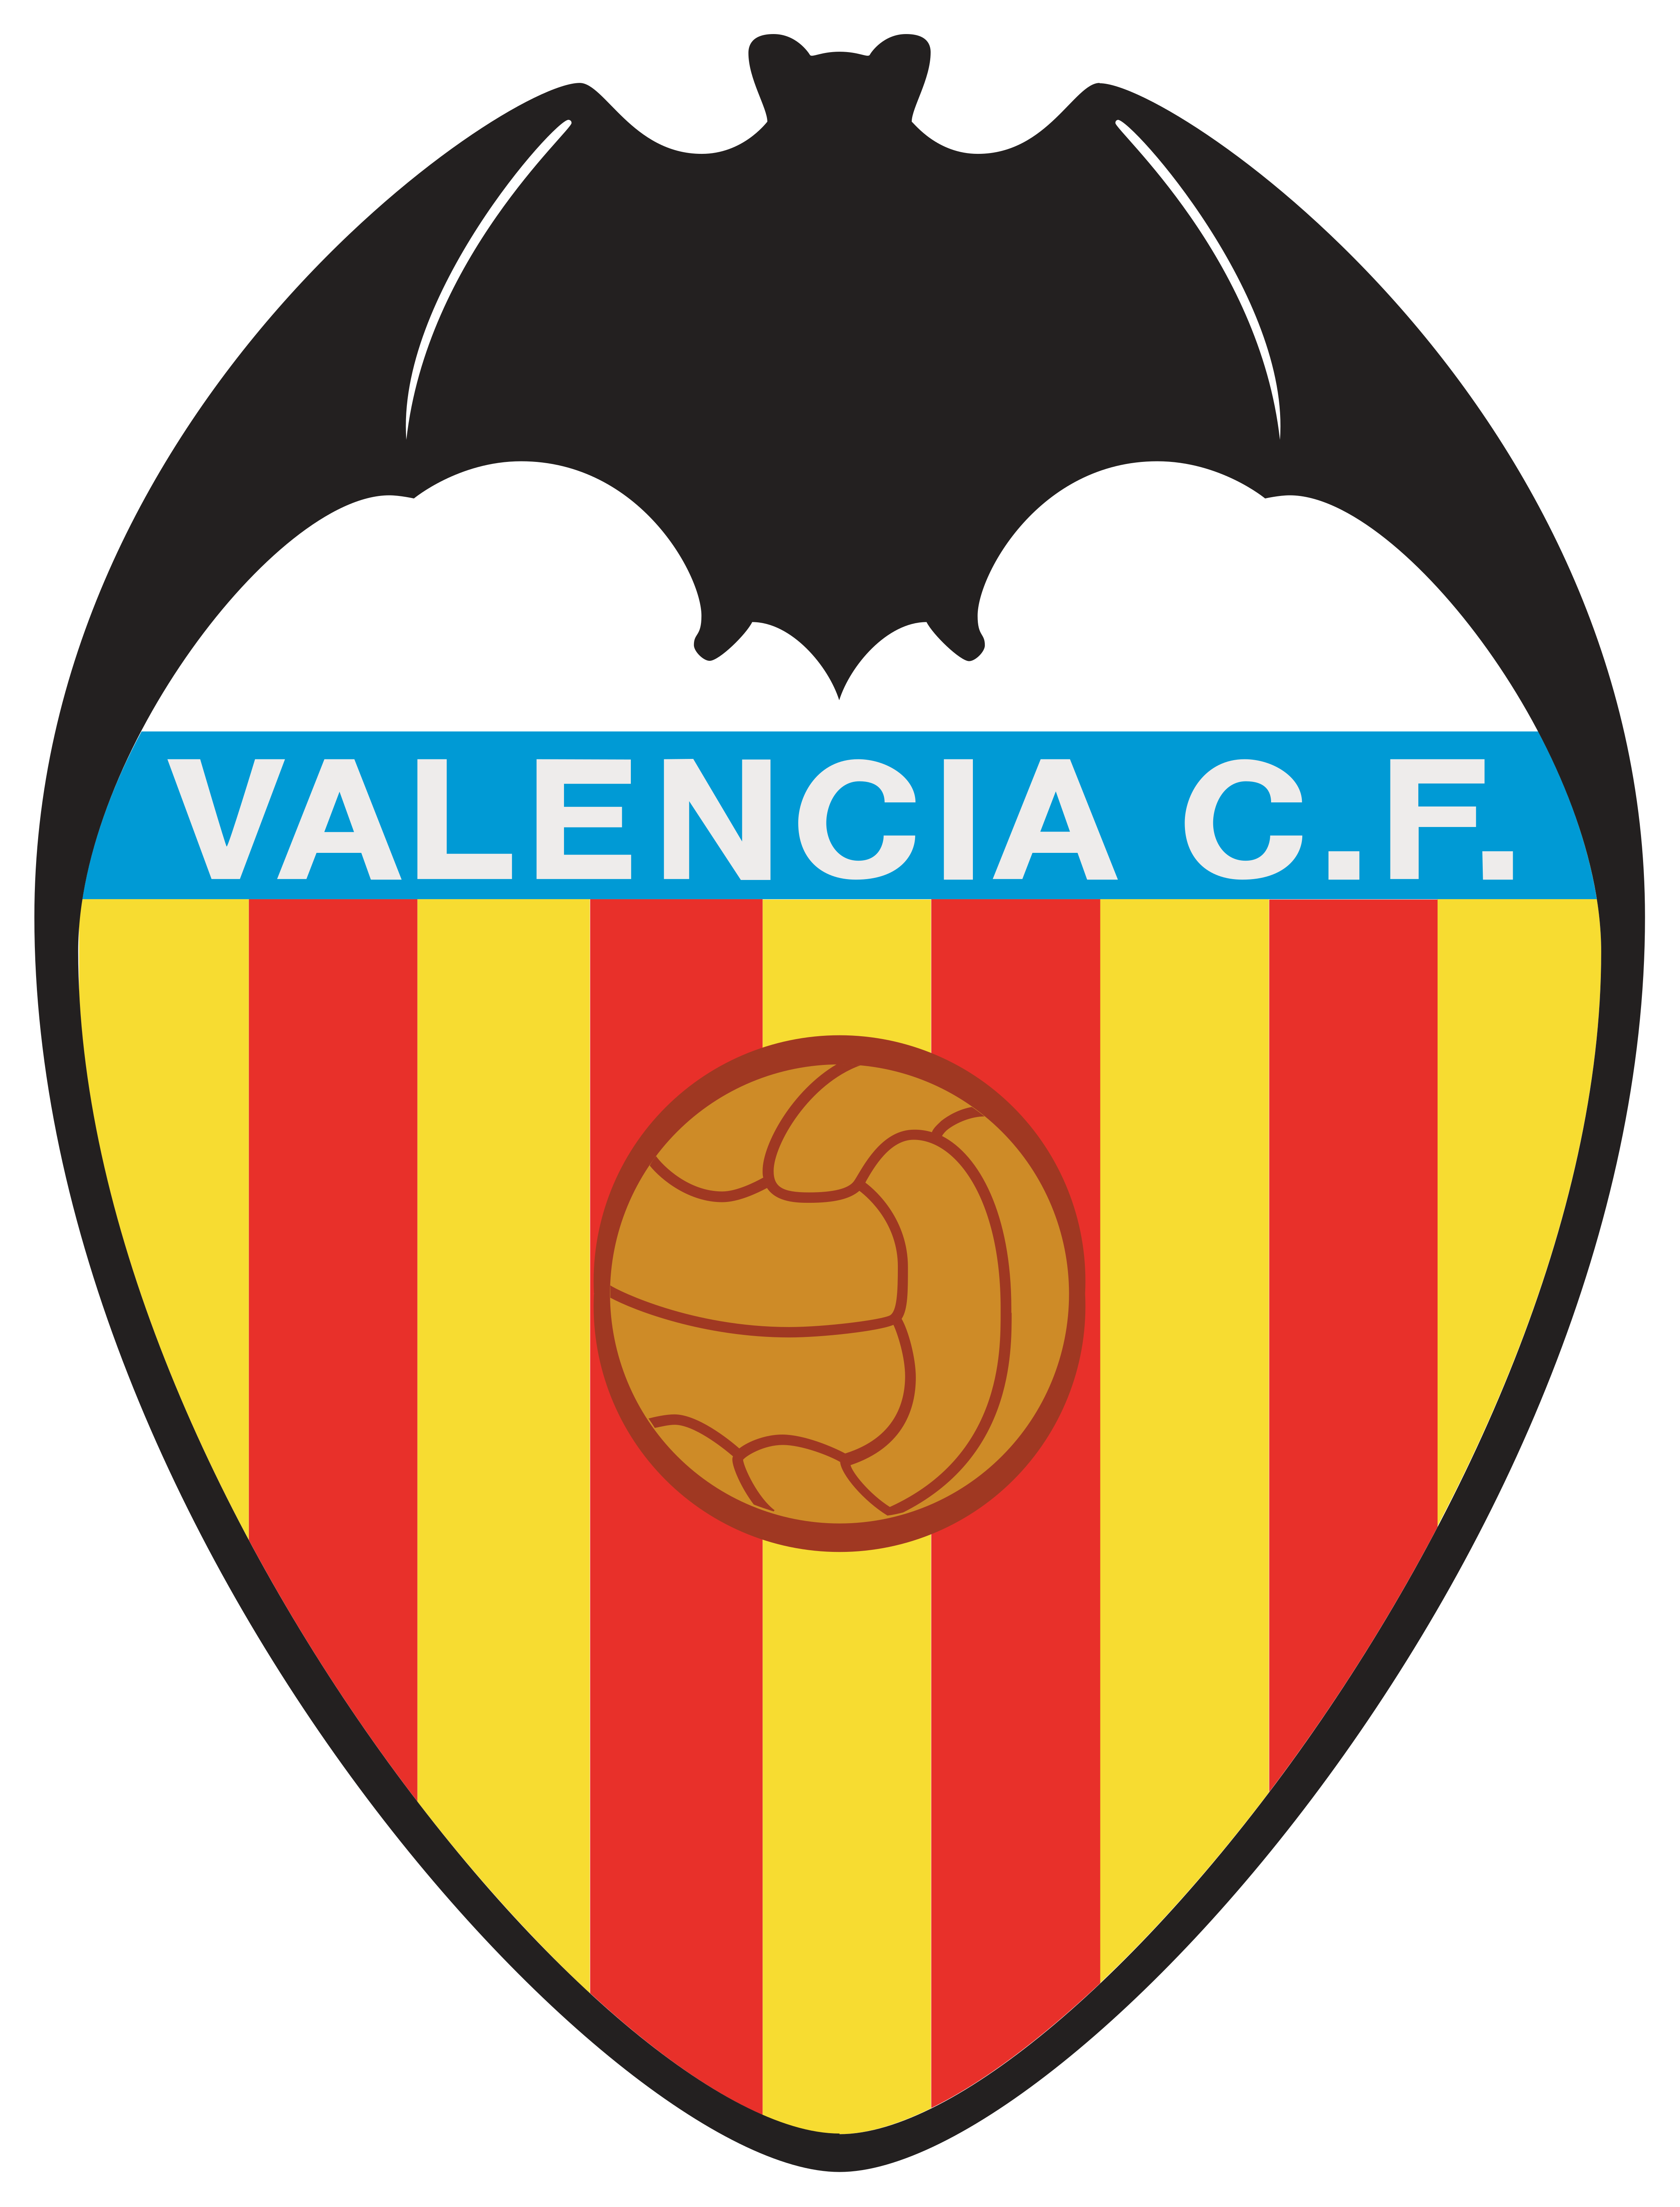 valencia cf logo escudo - Valencia CF Logo – Escudo